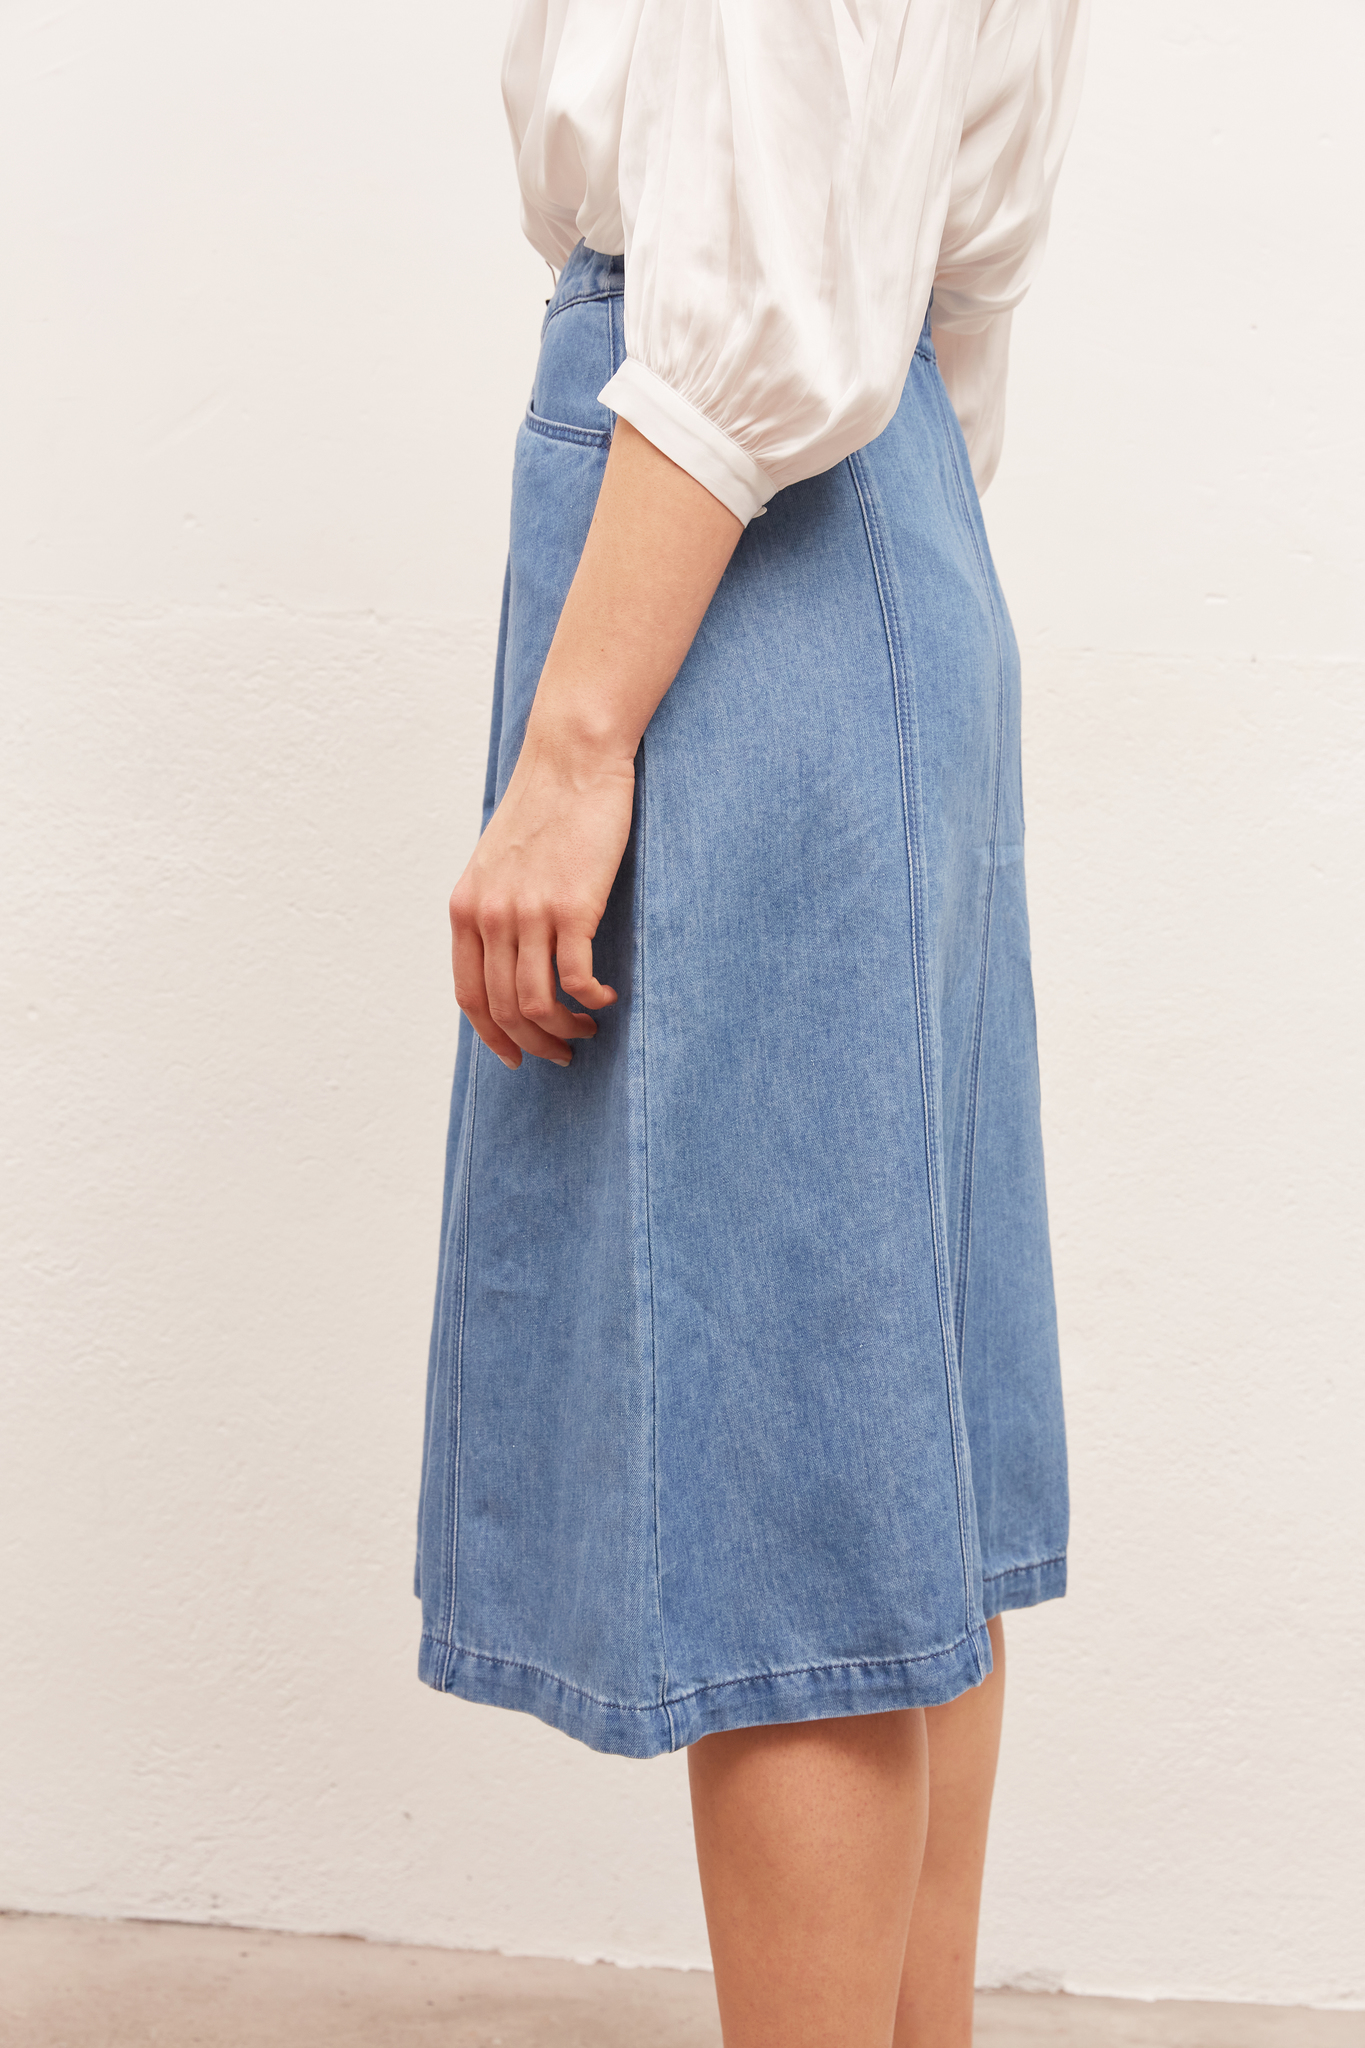 LILOU - Джинсовая юбка-миди А-силуэта